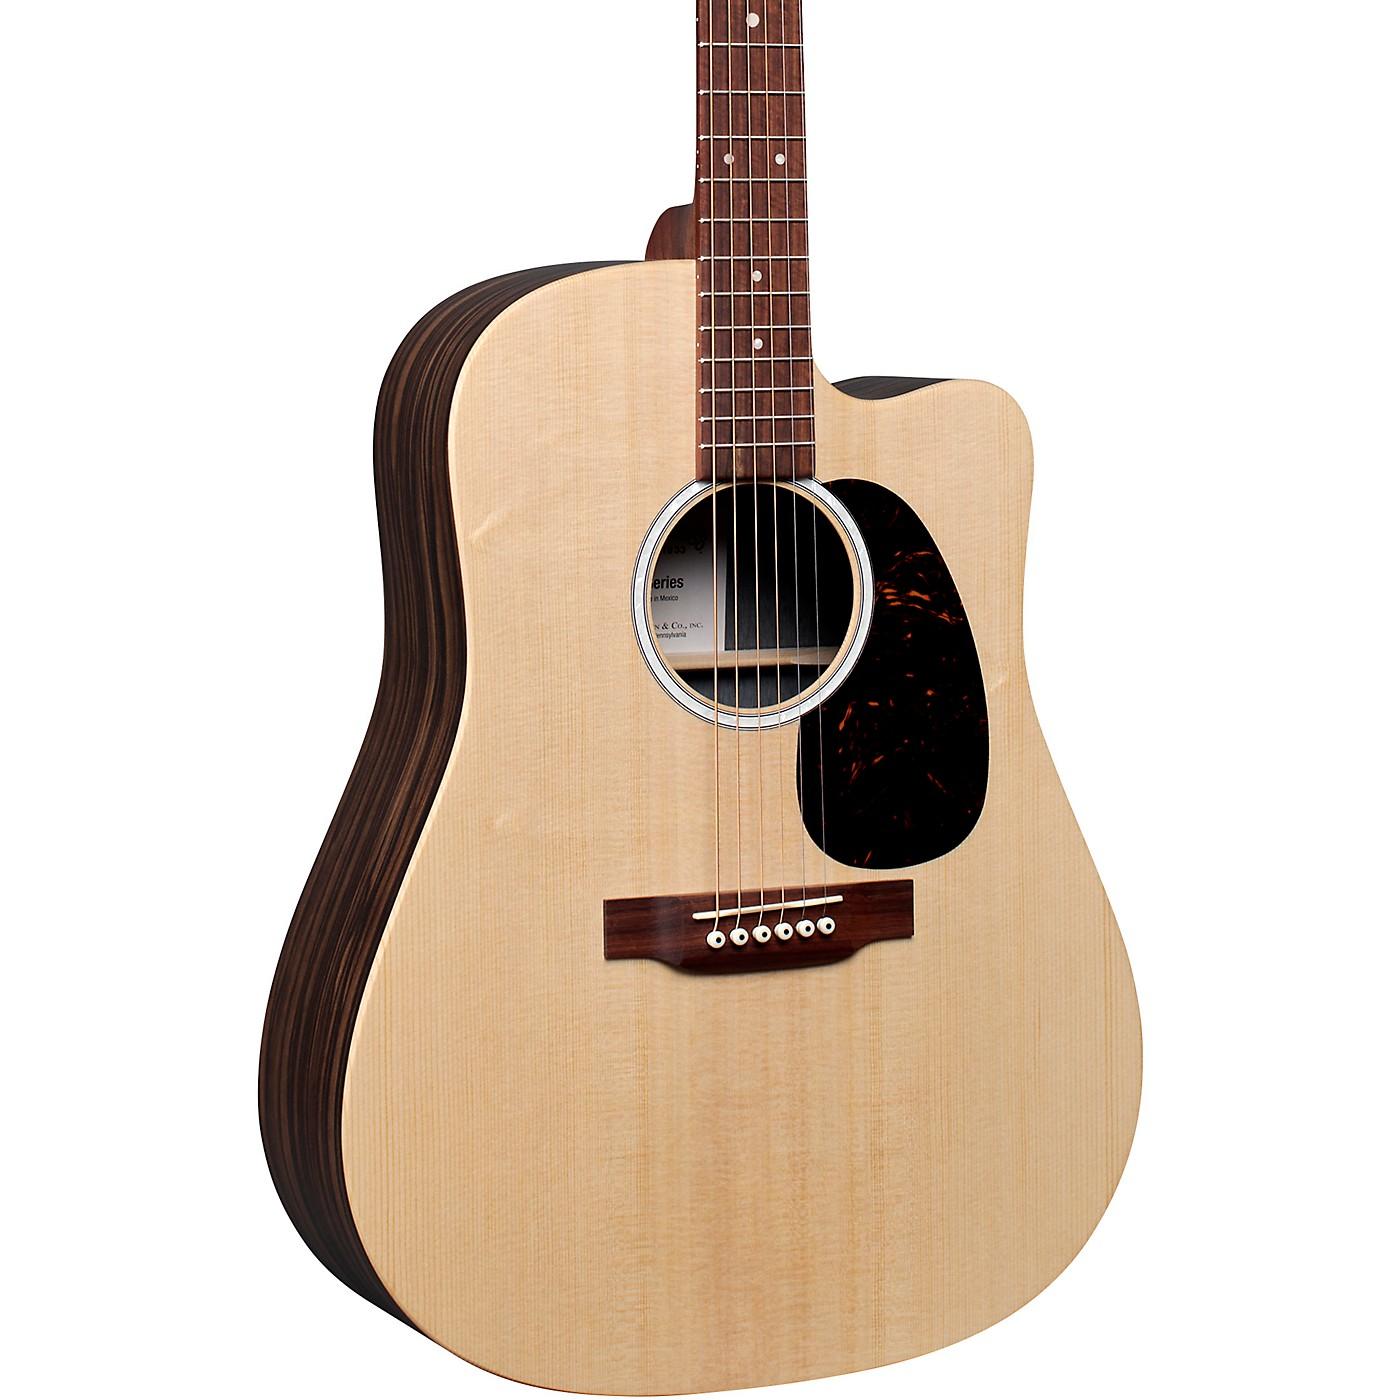 Martin DC-X2E Macassar Ebony Dreadnought Acoustic-Electric Guitar thumbnail